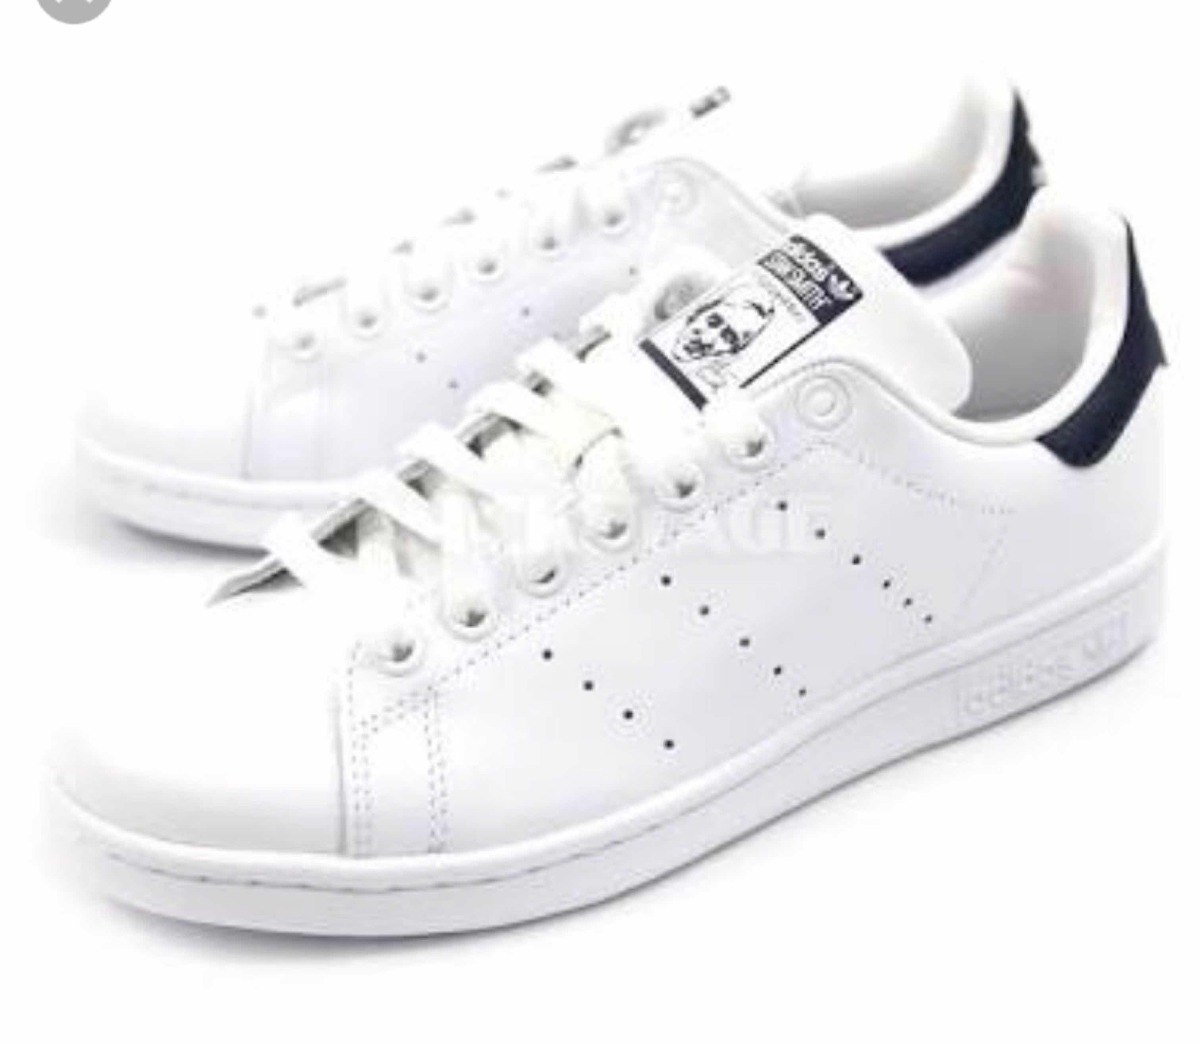 newest 5b8fb 70b3e Tenis adidas Stan Smith Blanco #7.5 #8 #8.5 Mx